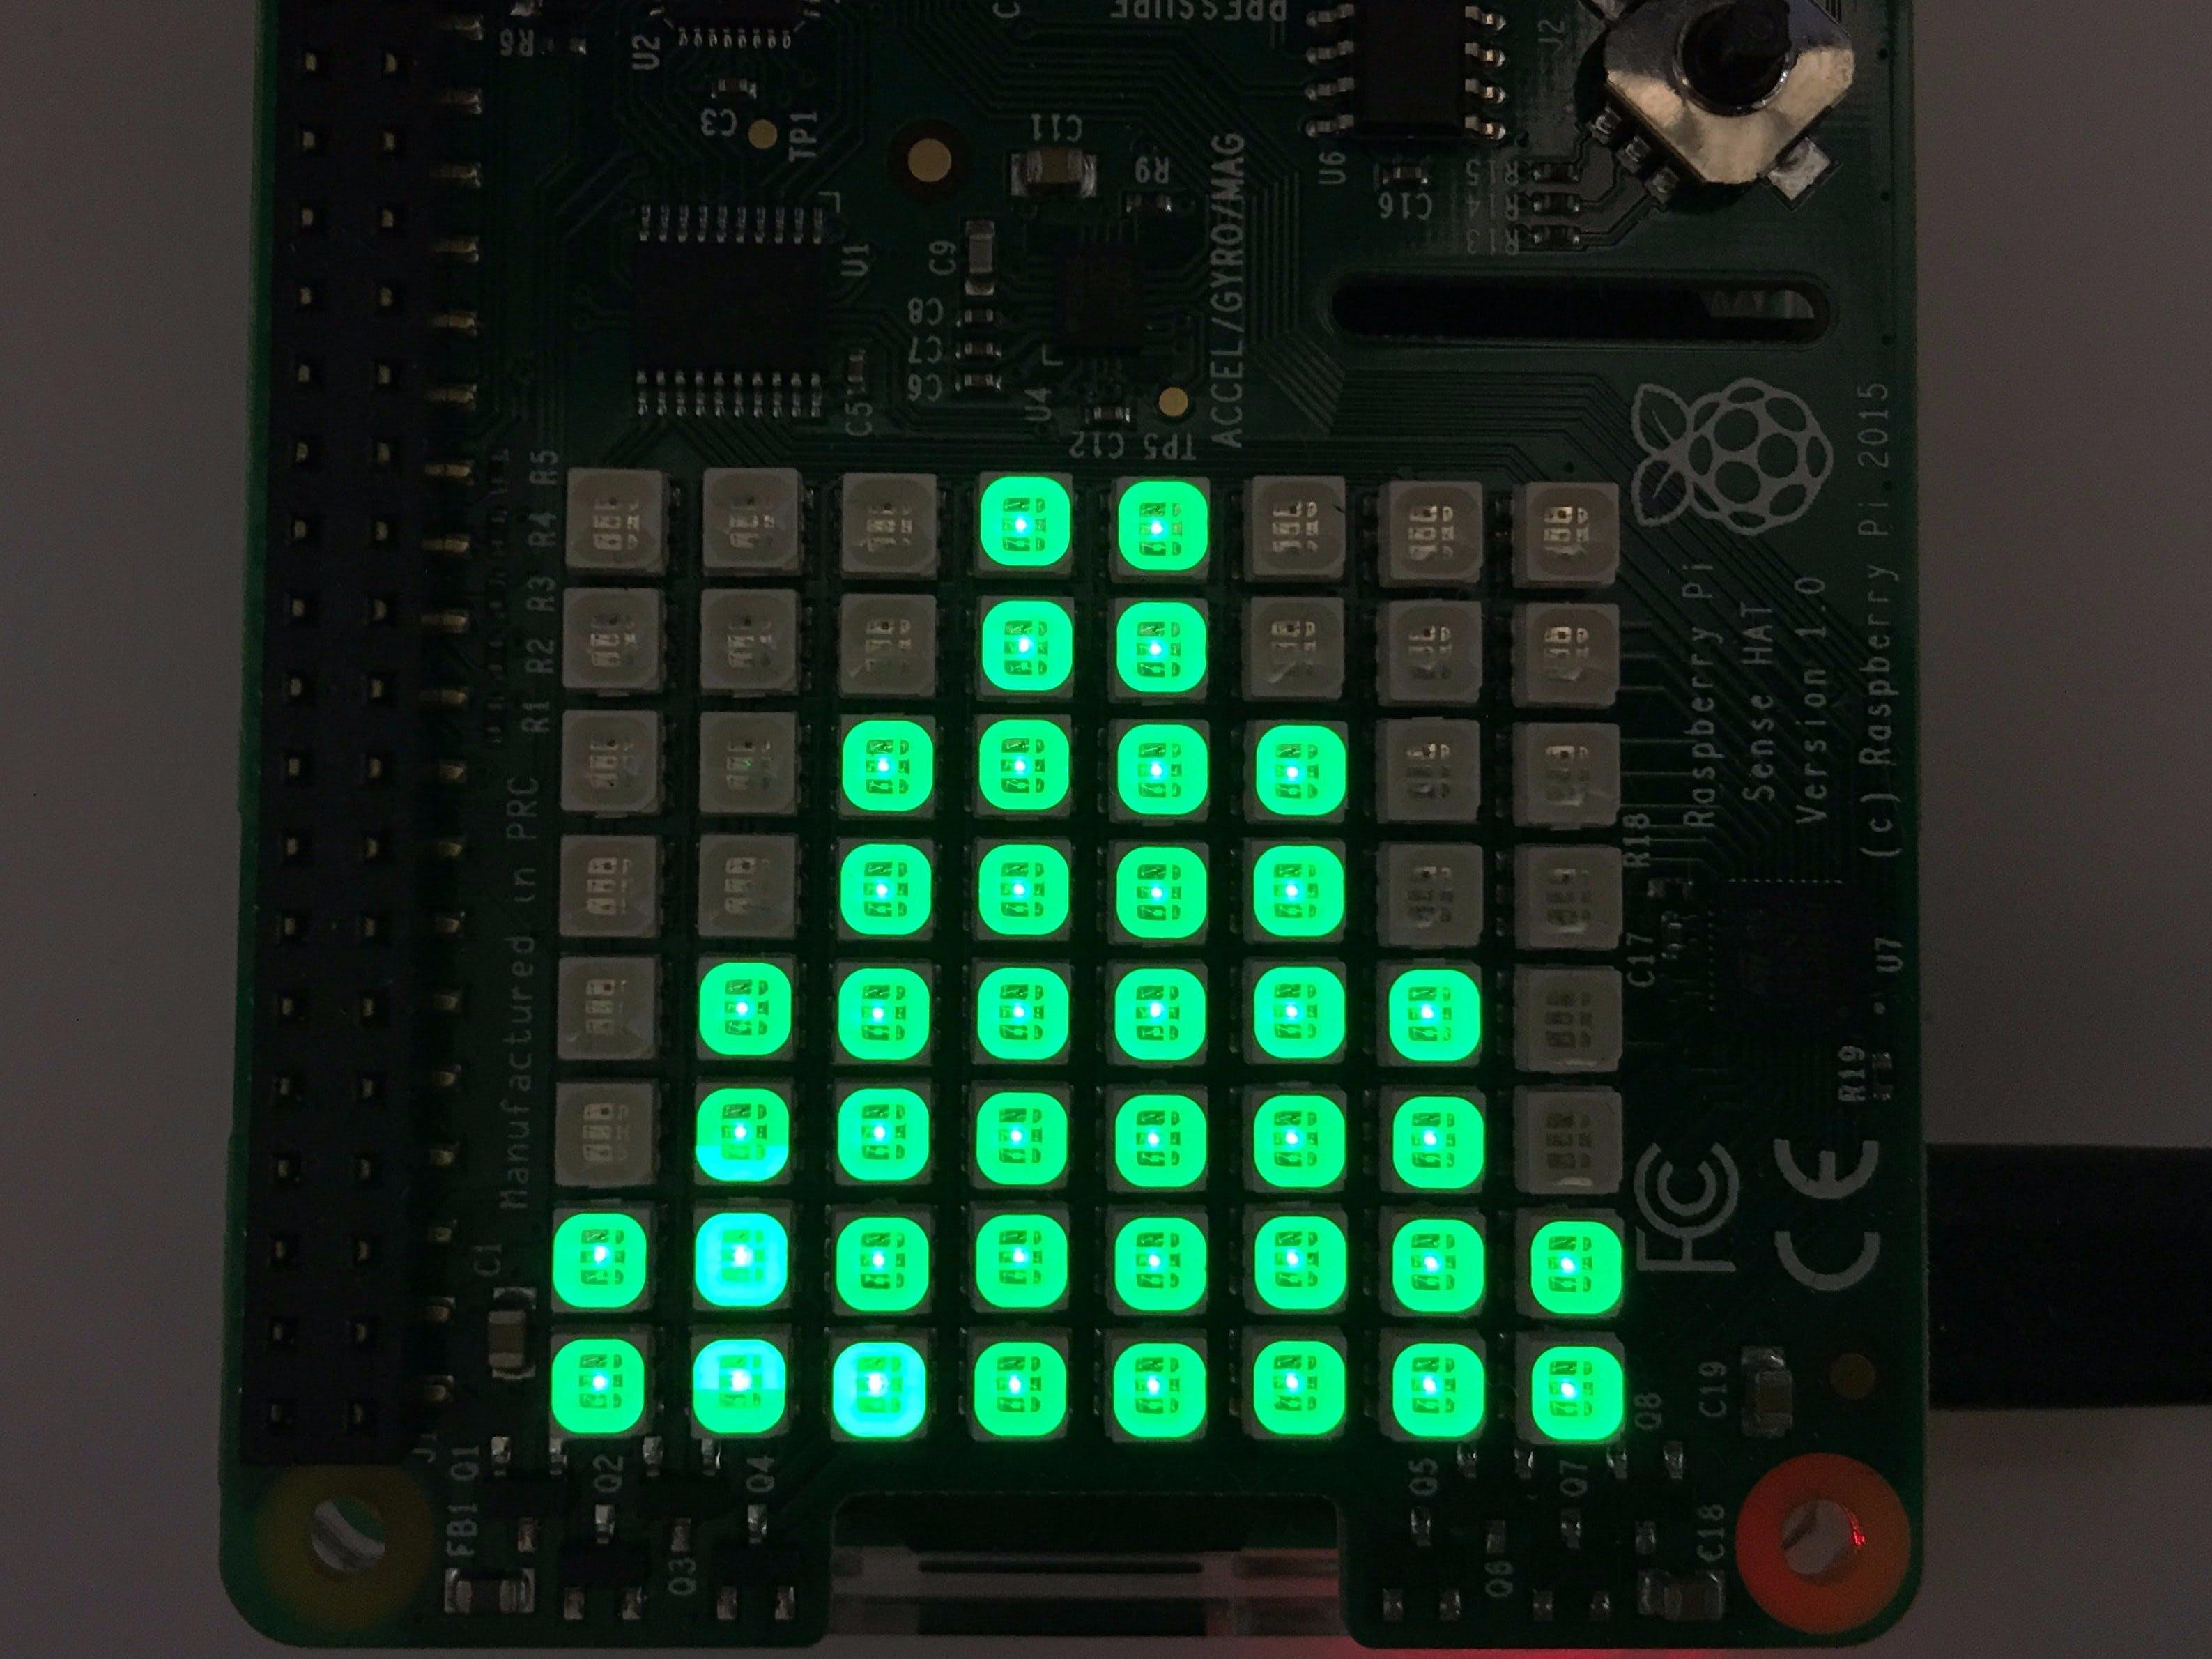 Raspberry Pi and Sense Hat Stock Symbol Price Ticker